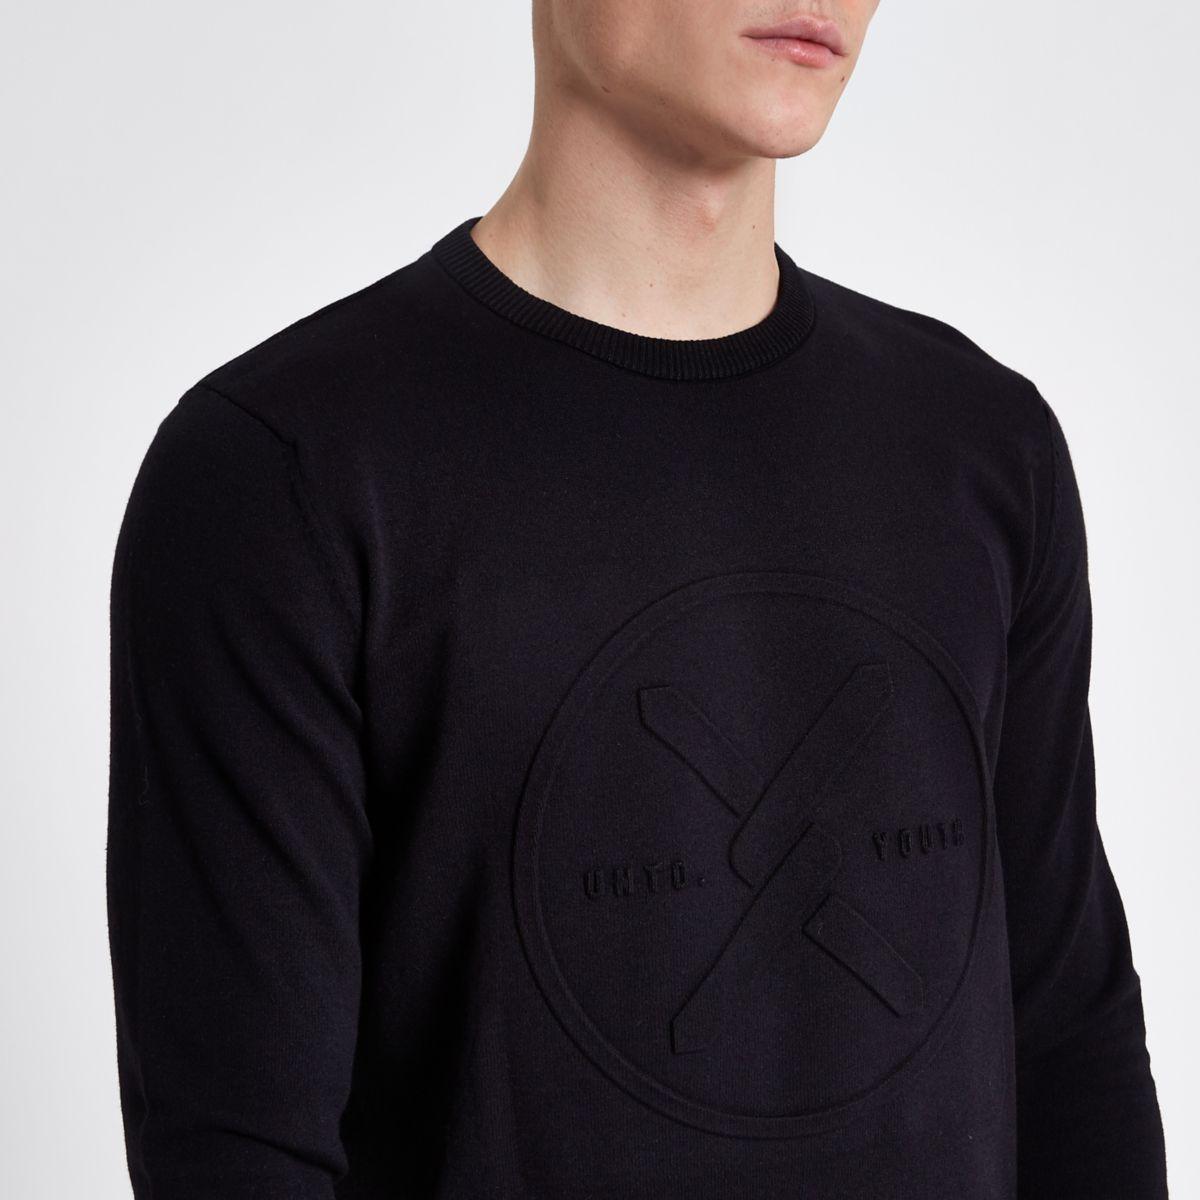 Jack & Jones Core black knit sweater